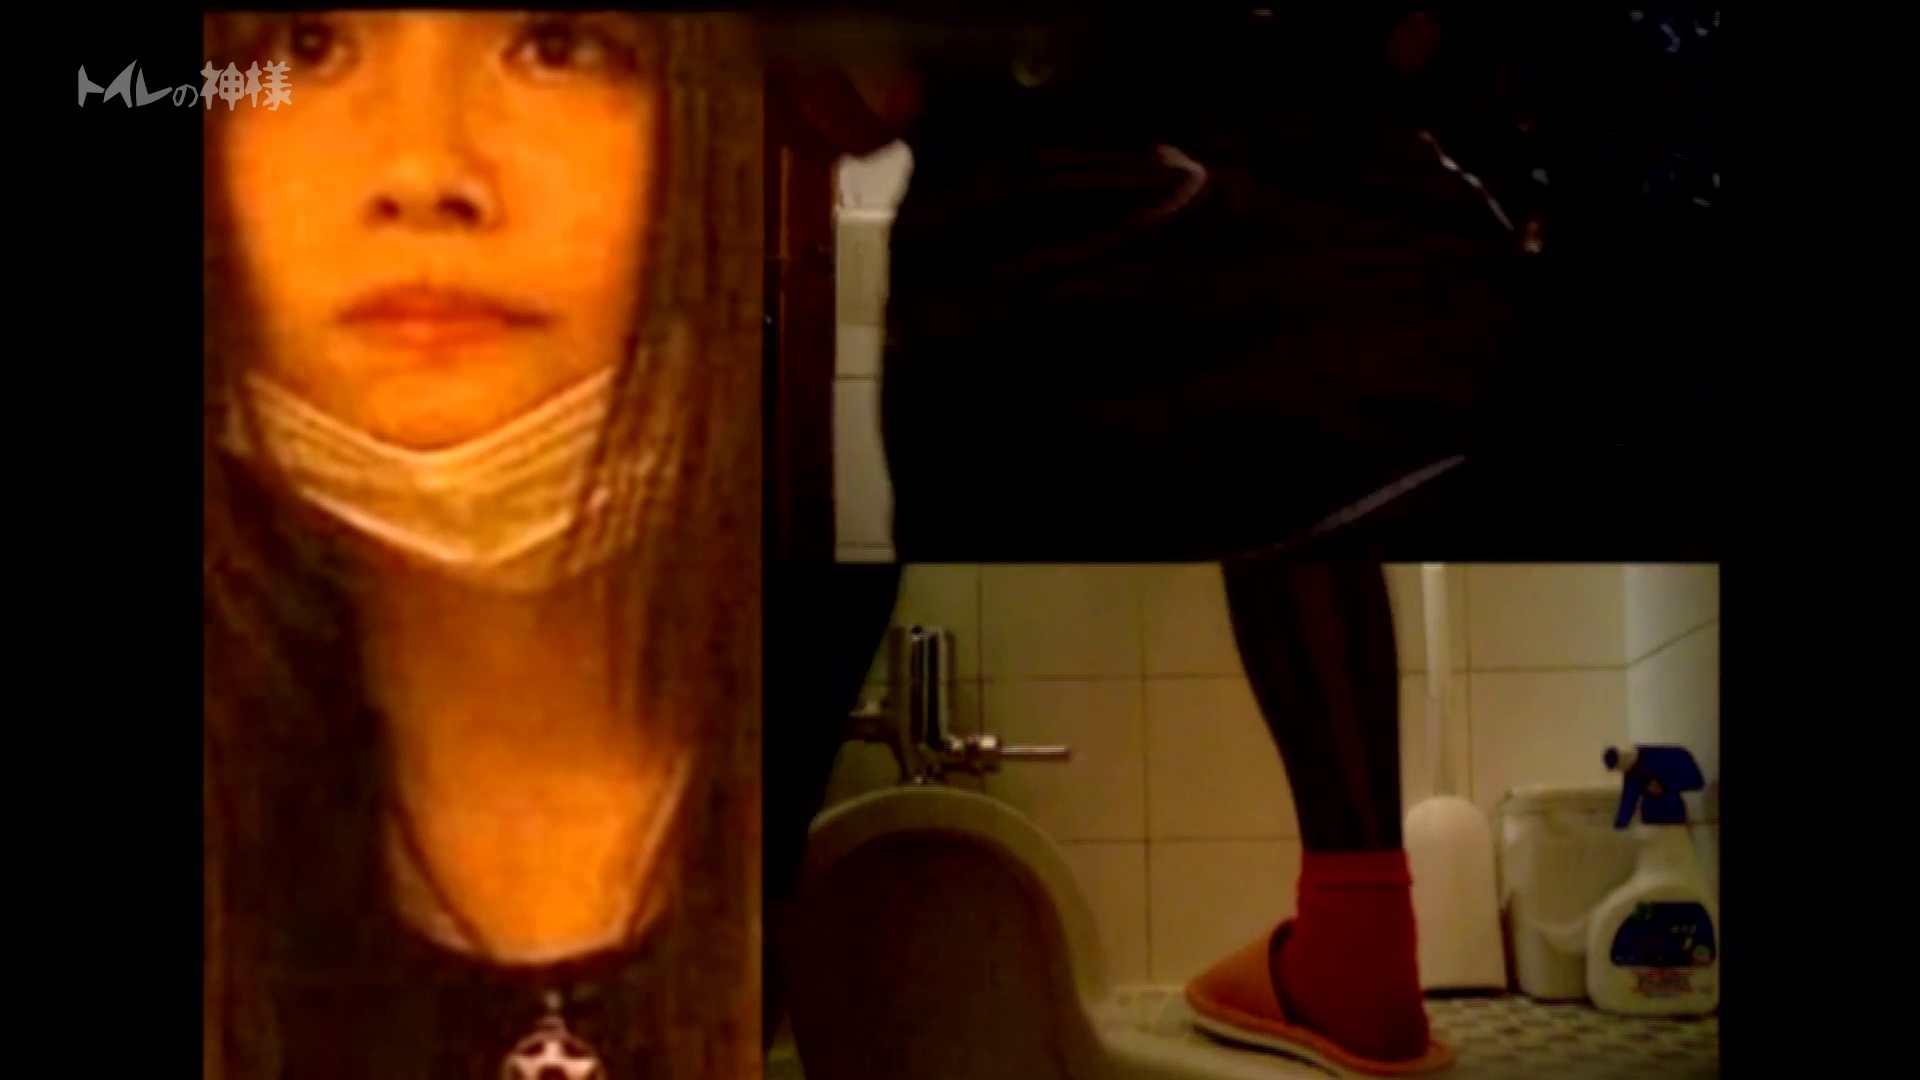 Vol.02 花の女子大生うんこ盗撮2 色っぽい女子大生 AV無料動画キャプチャ 82pic 18